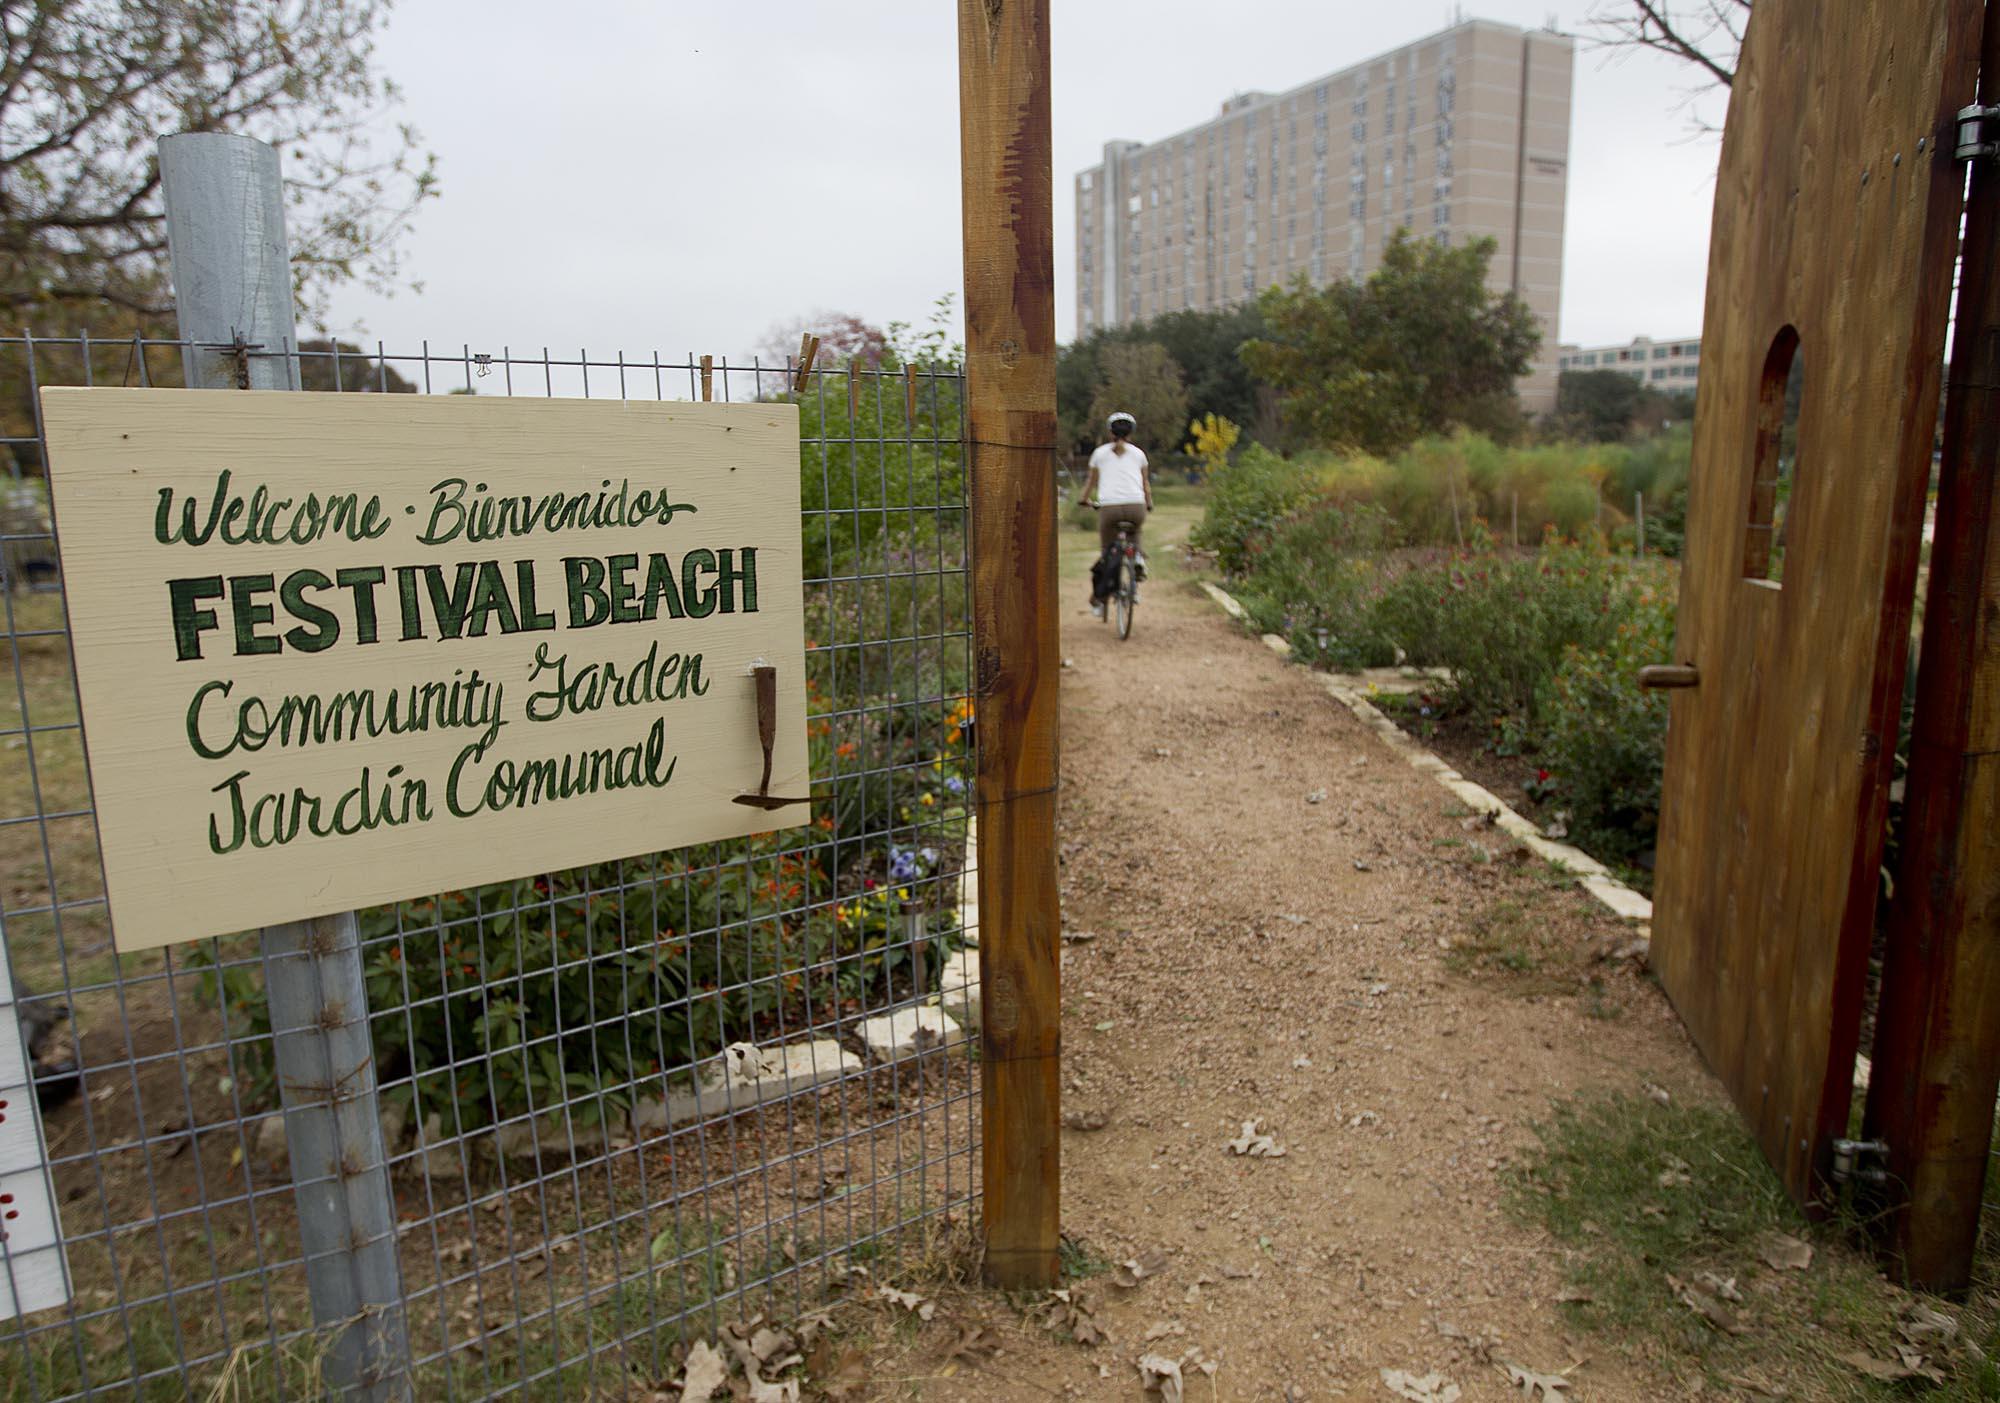 Our History: The Festival Beach Garden Gate – FESTIVAL BEACH ...